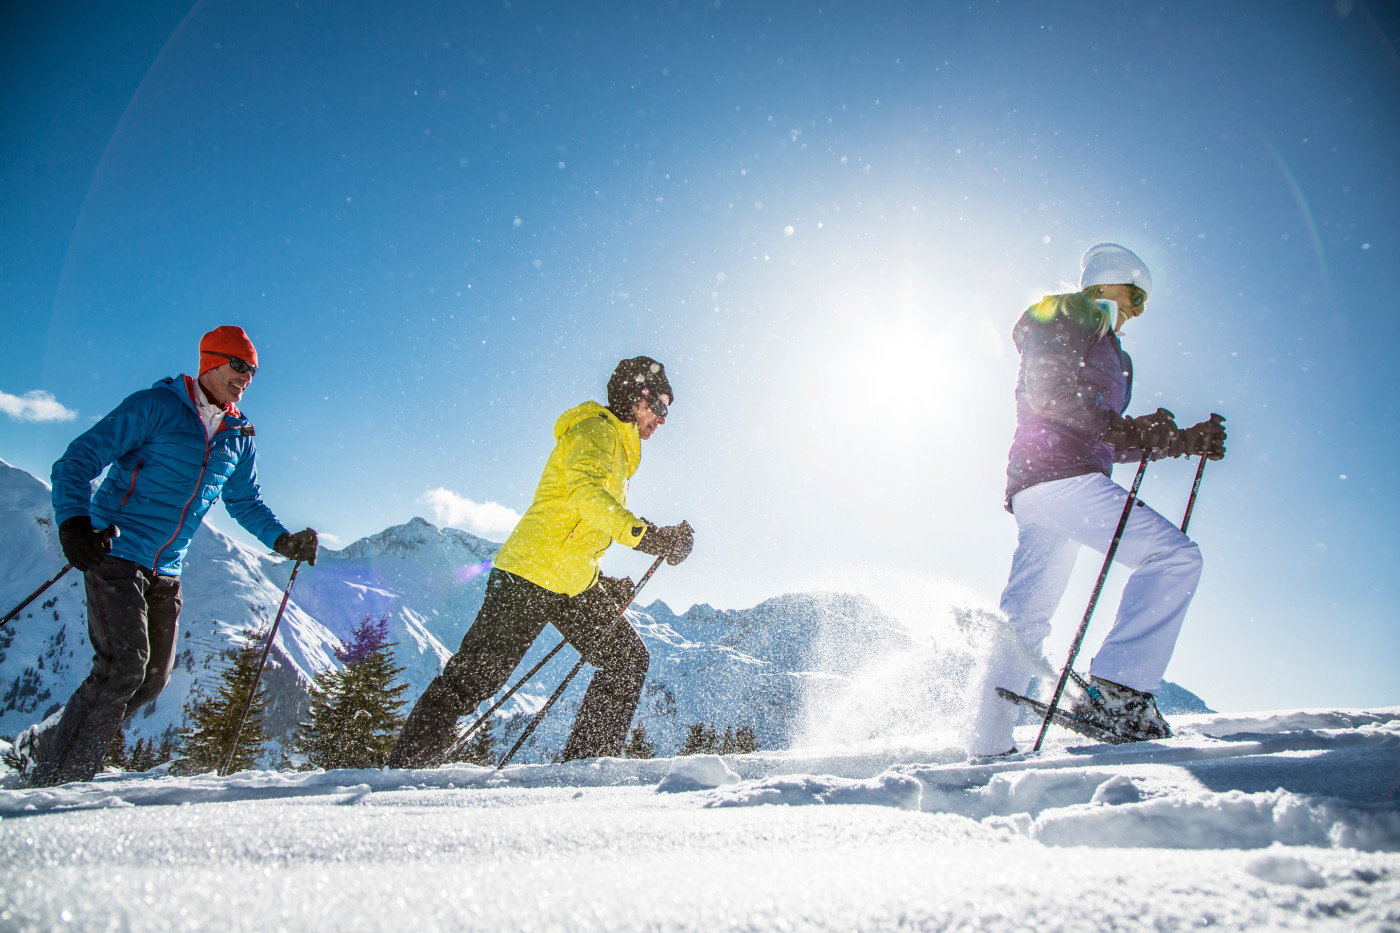 Schneeschuhwandern in Lech (Bild: Lech Zürs Tourismus, Christoph Schöch)